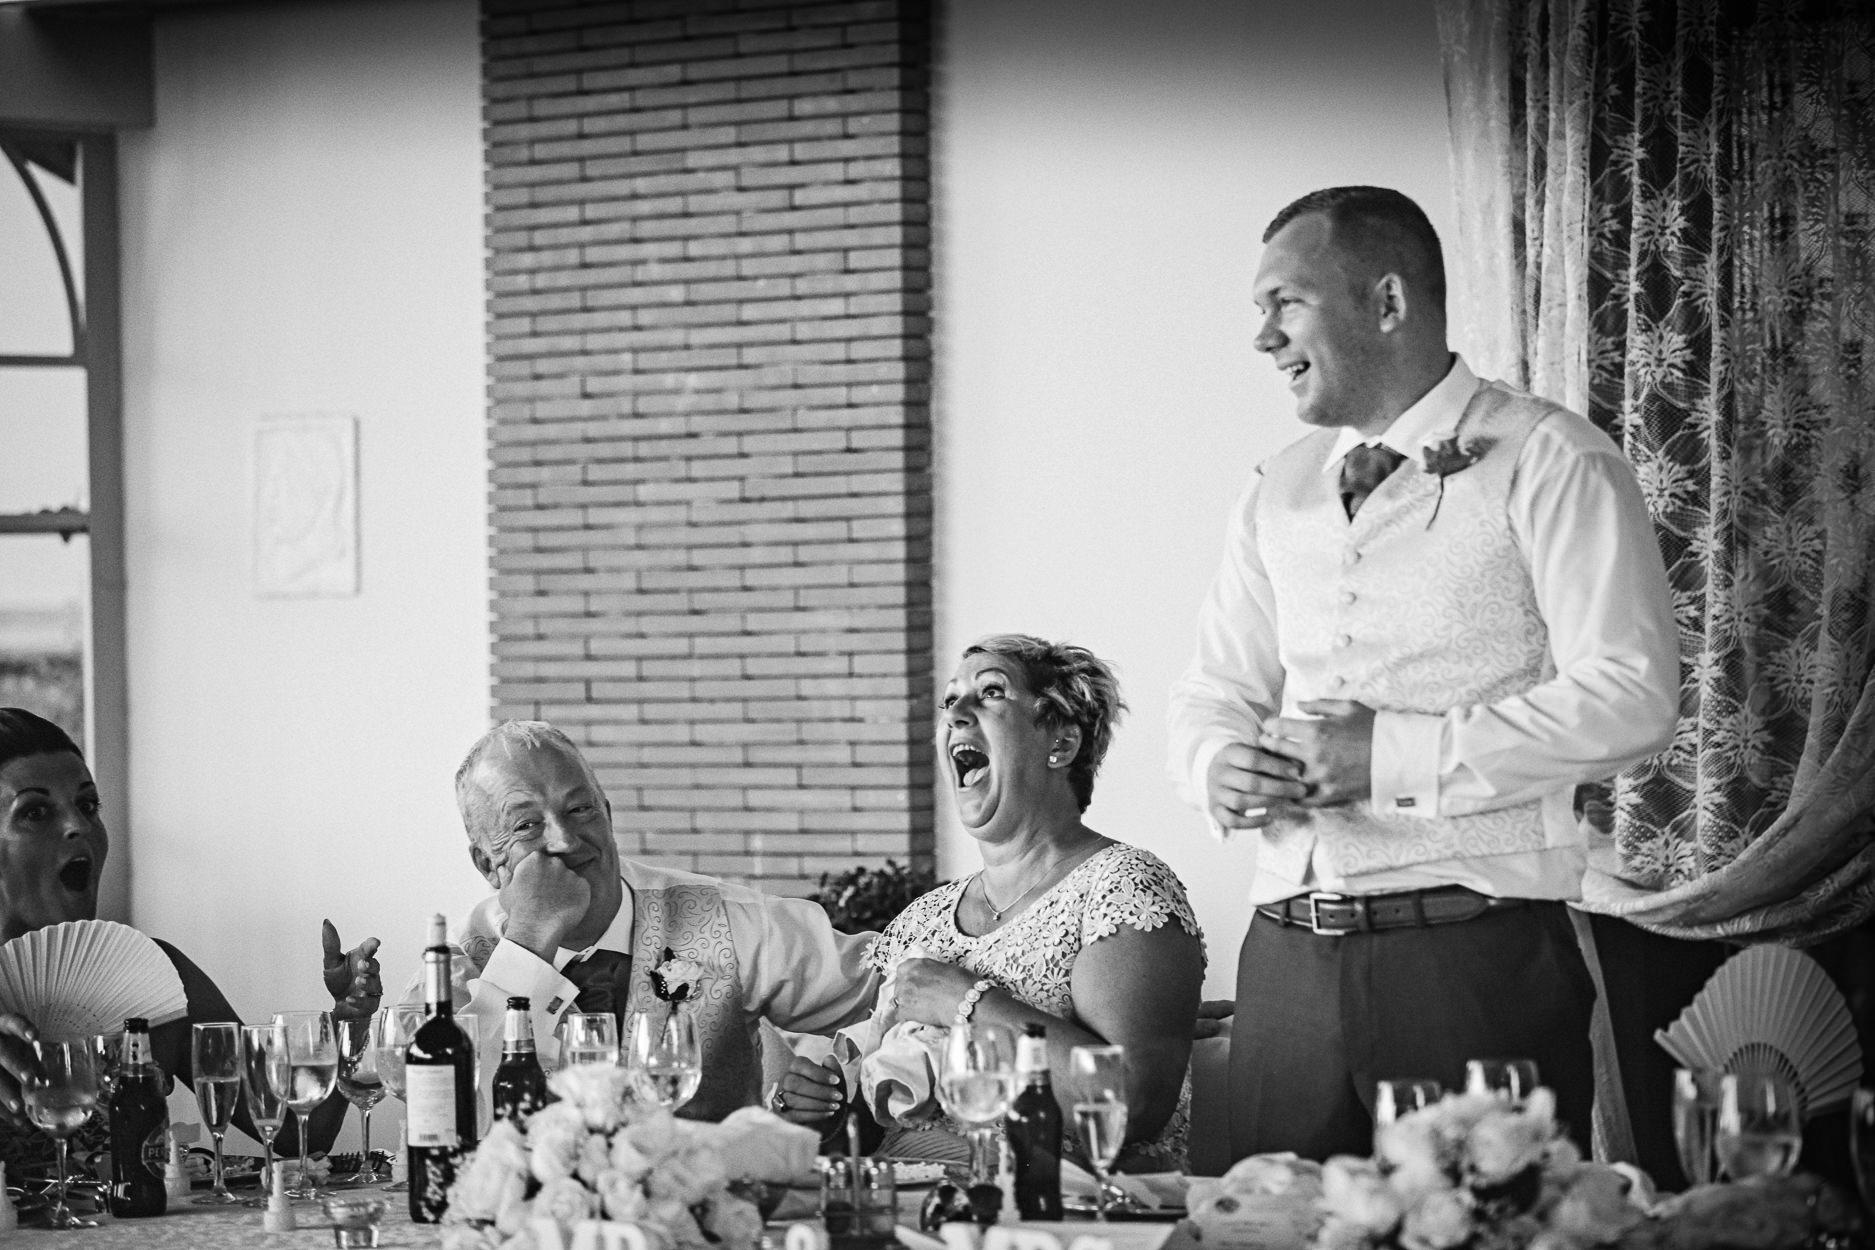 Amalfi-Coast-wedding-venue-Wedding-Photography-Villa Antiche Mura-Sorrento-Italy-14